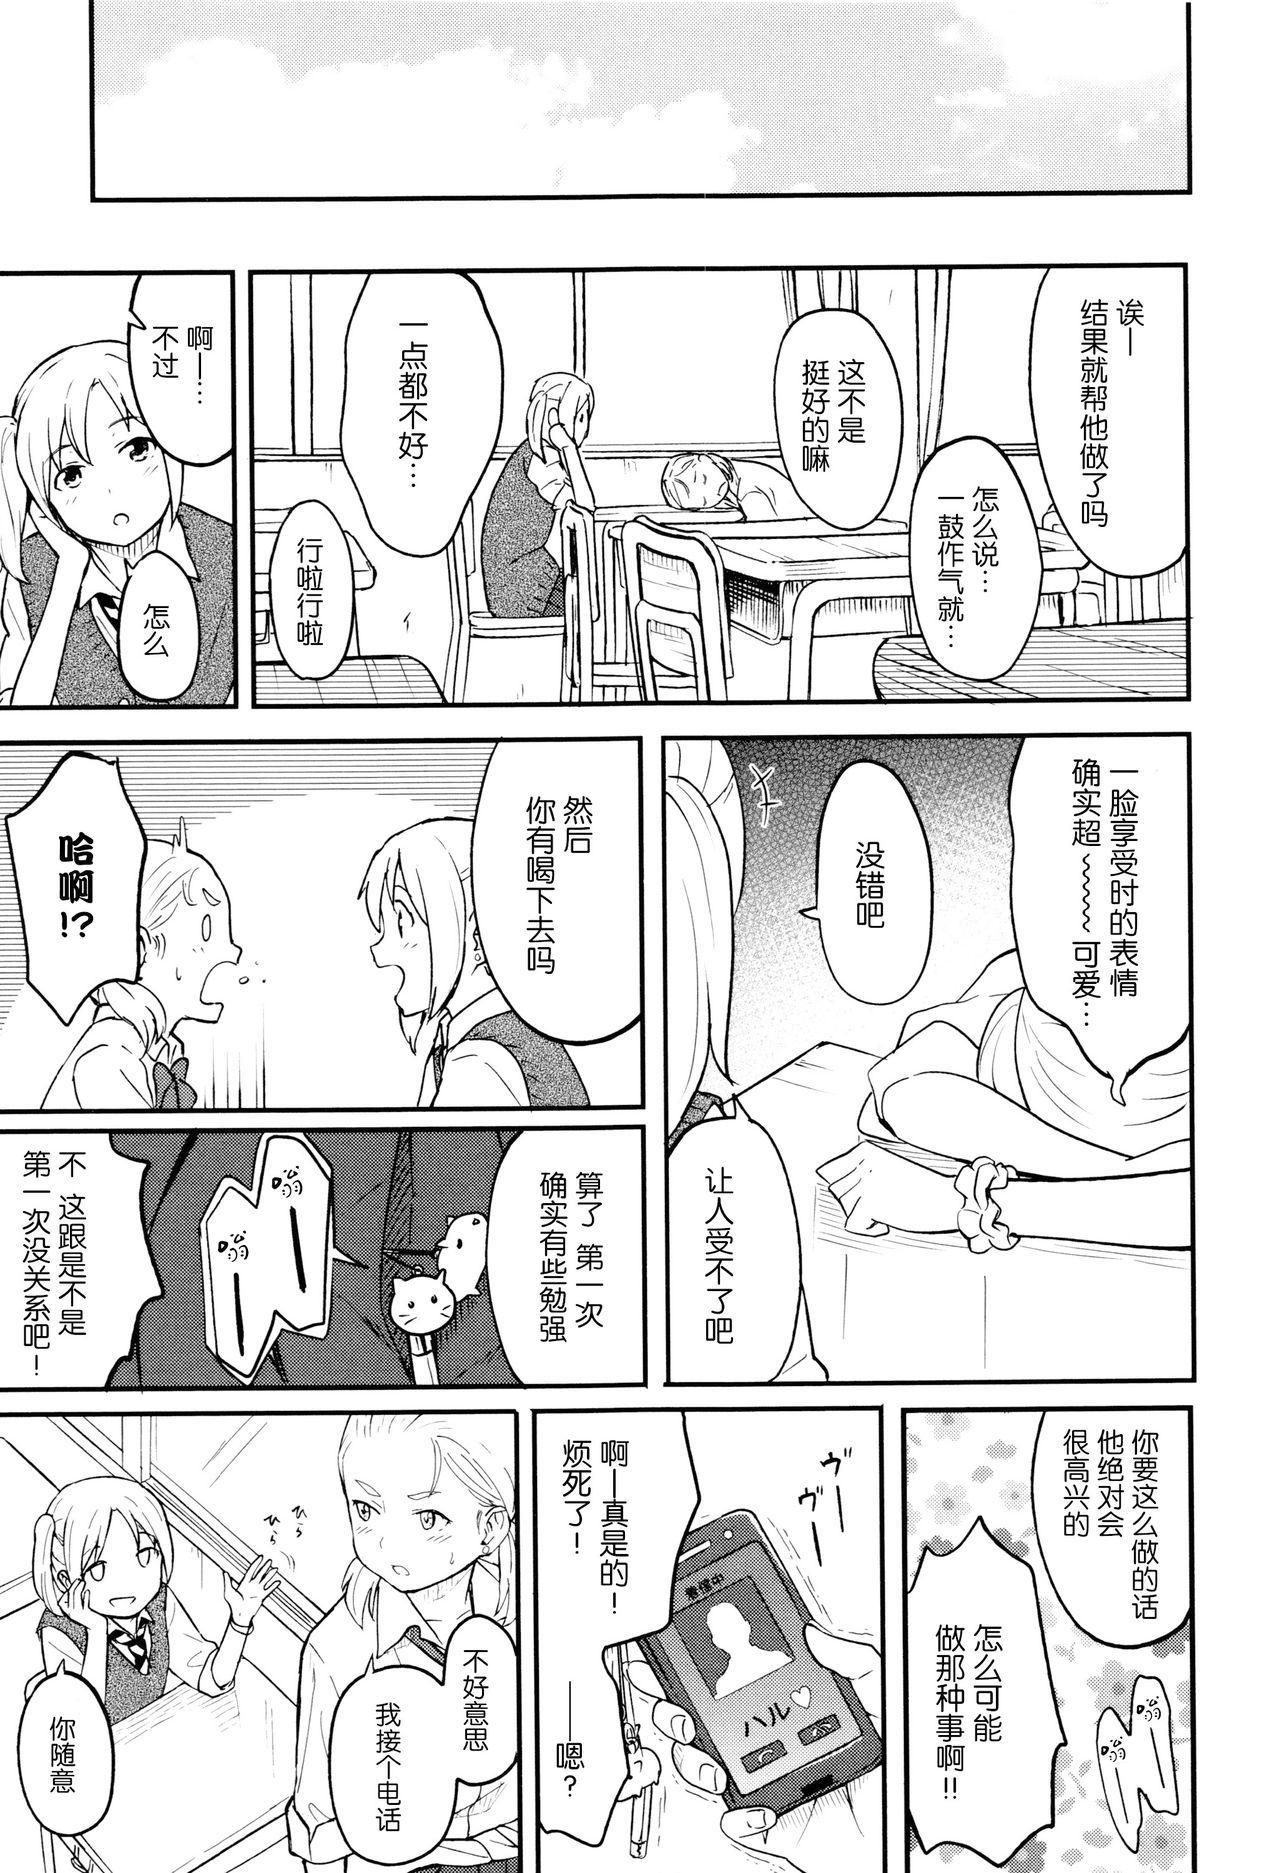 Tokubetsu na Mainichi - Special daily 77